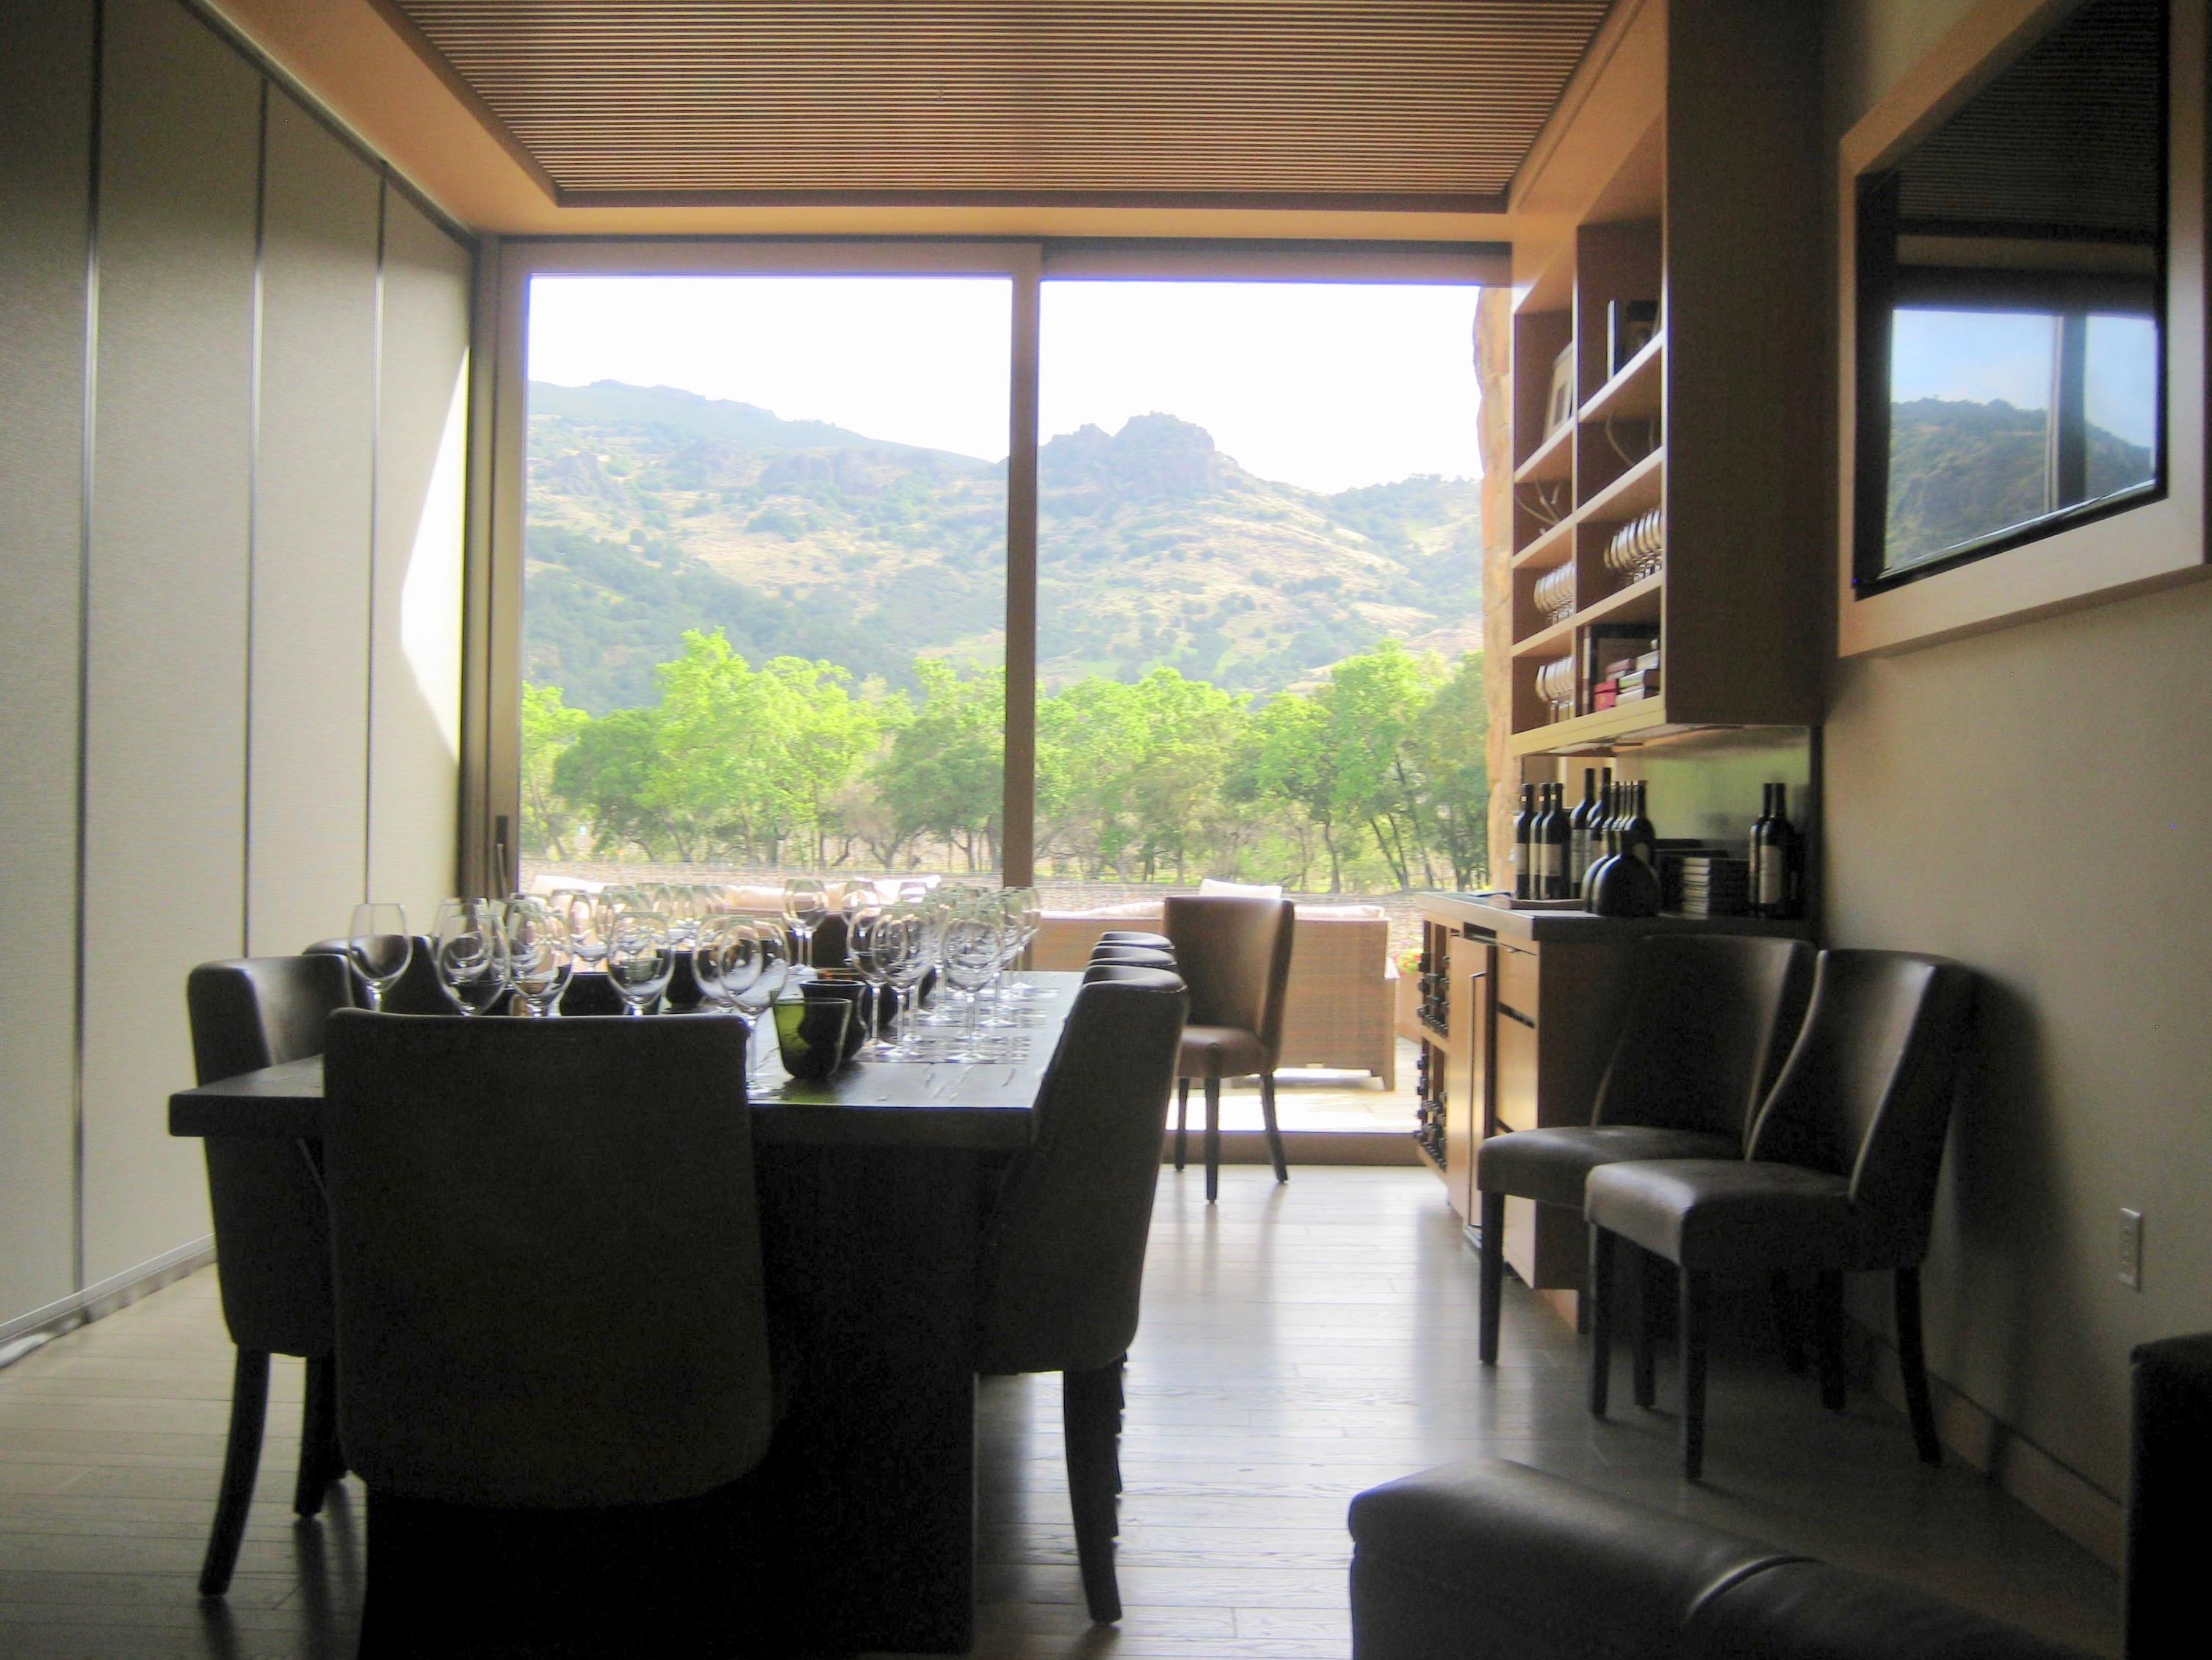 8. Private tasting room